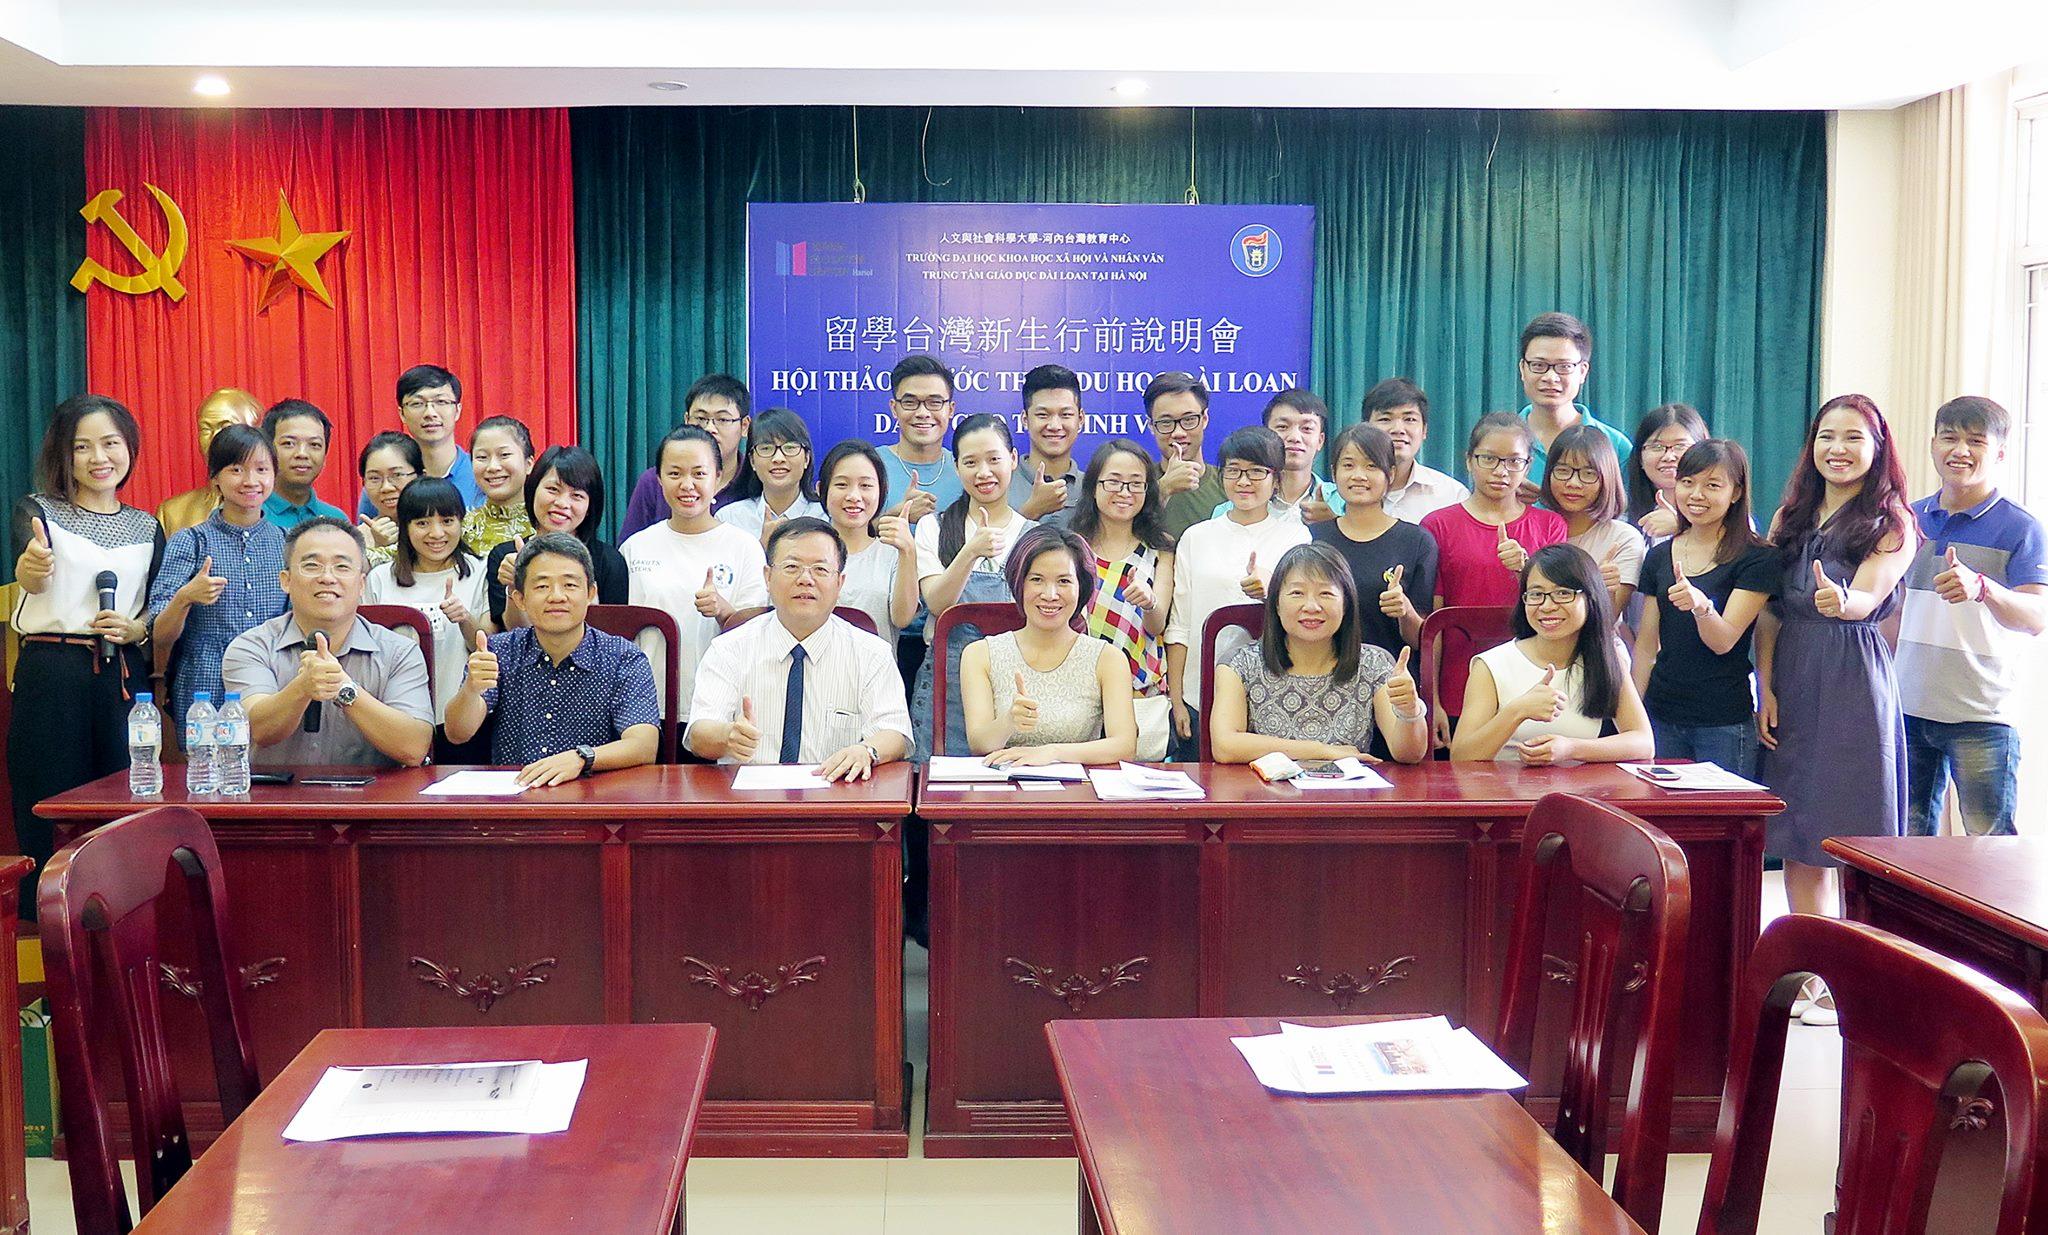 Taiwan Education Center of Hanoi conduct international students seminar